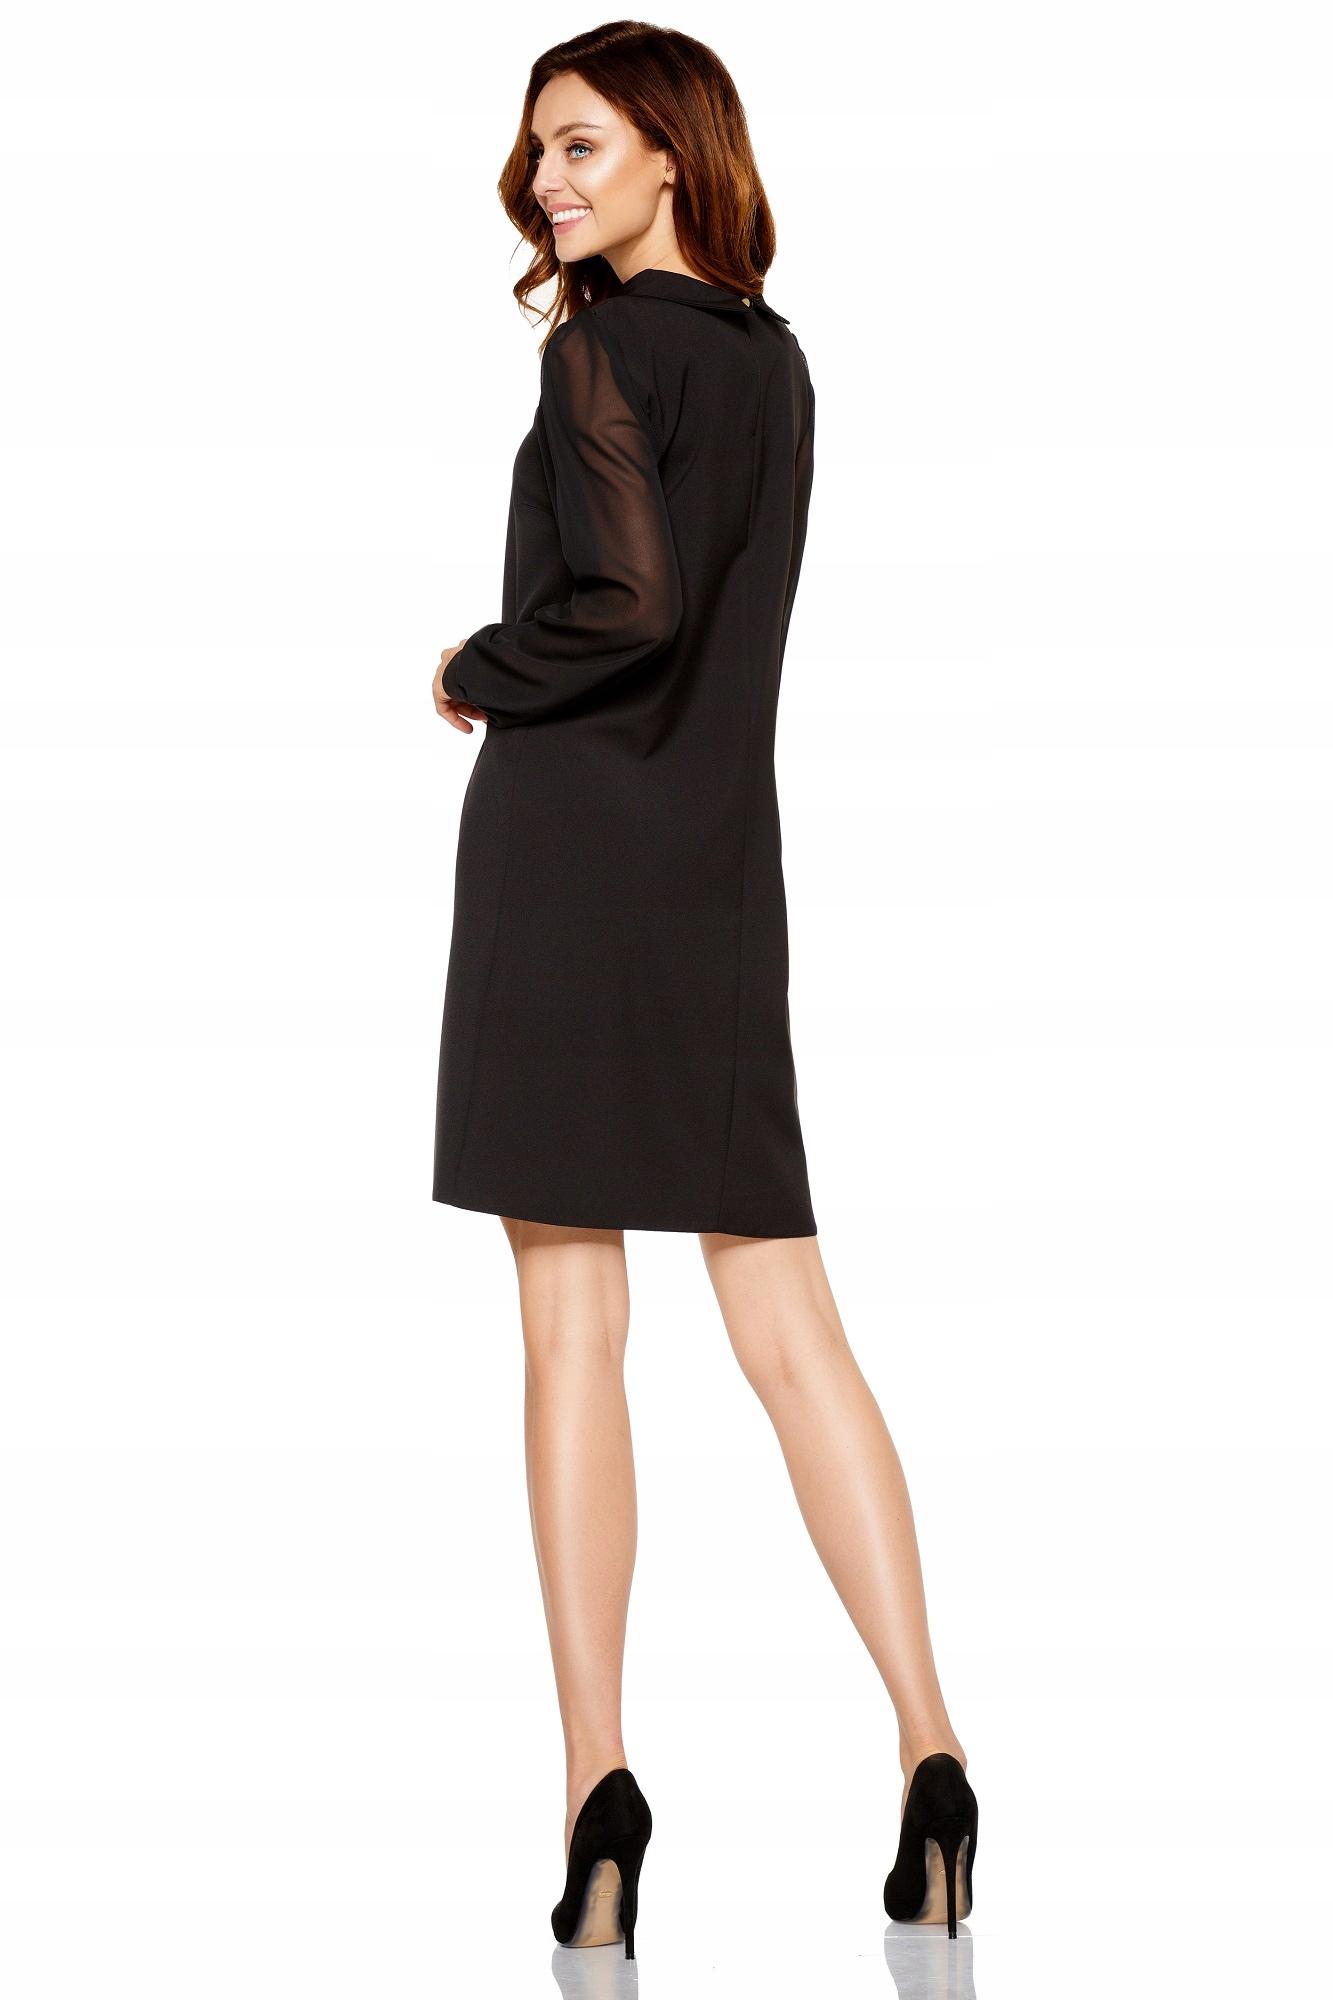 bee43291 Elegancka sukienka z kołnierzykiem czarna 40 L Lem - 7686302420 ...